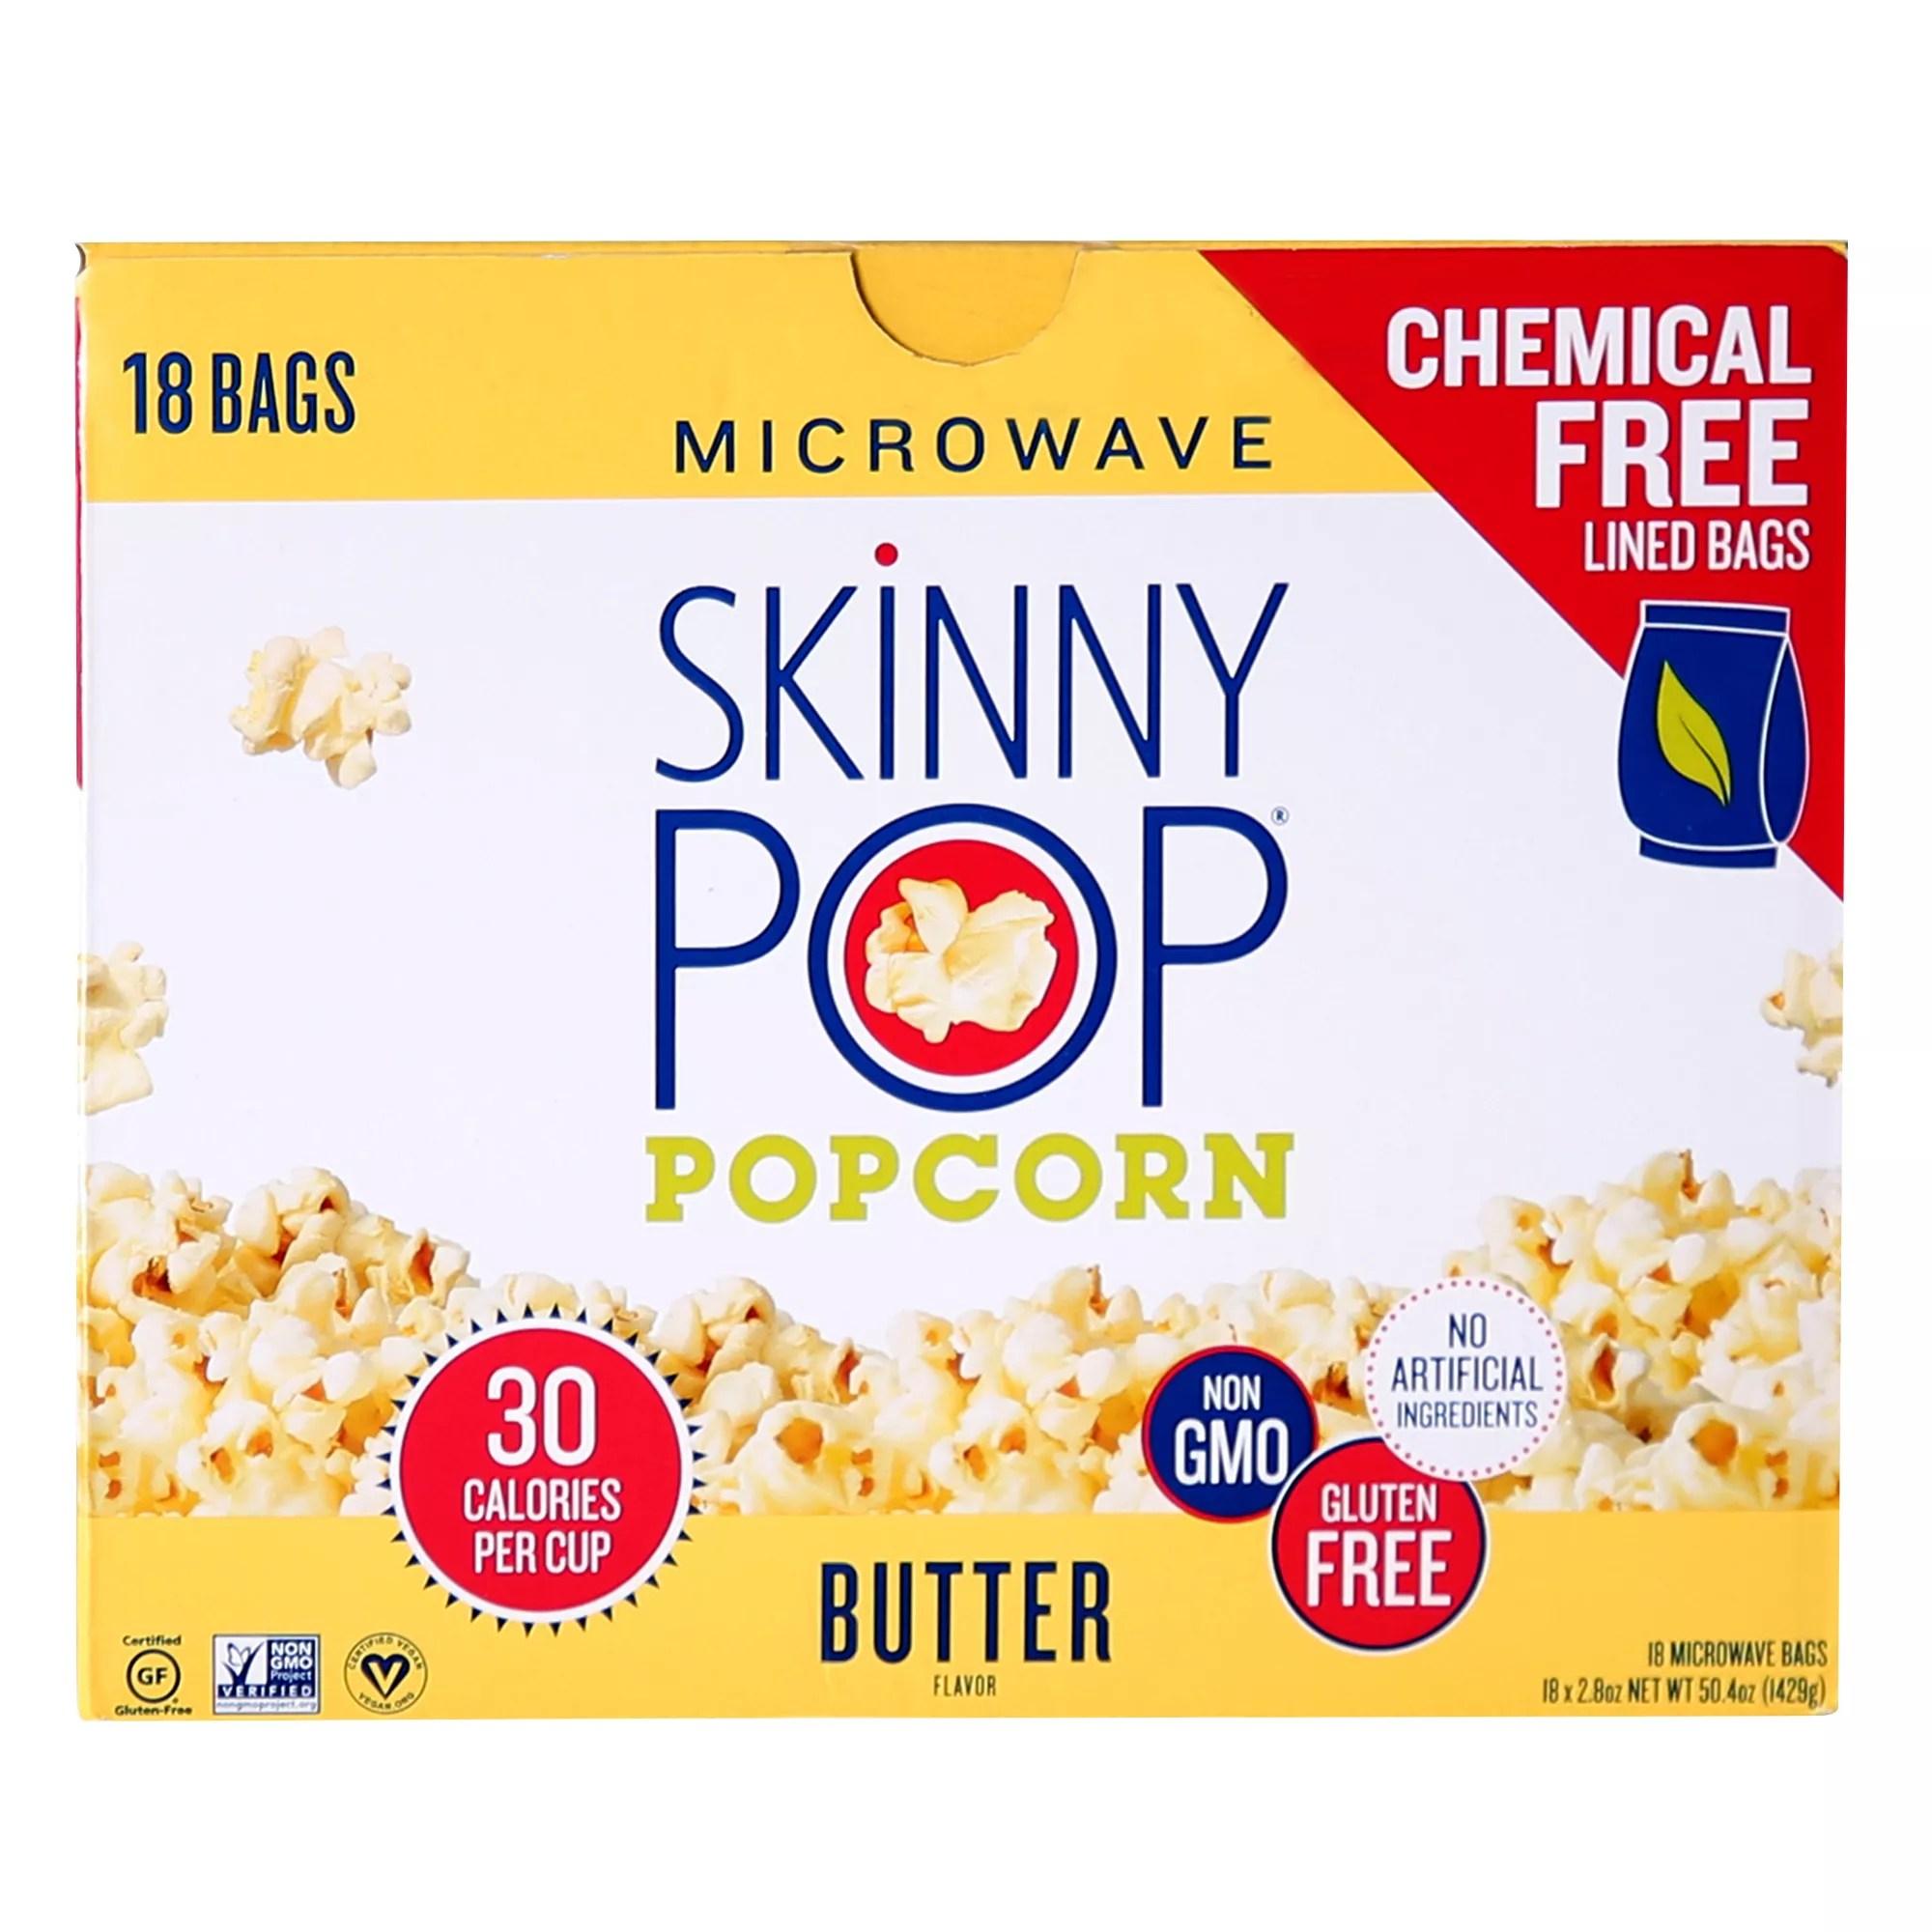 skinnypop butter flavor microwave popcorn 18 ct